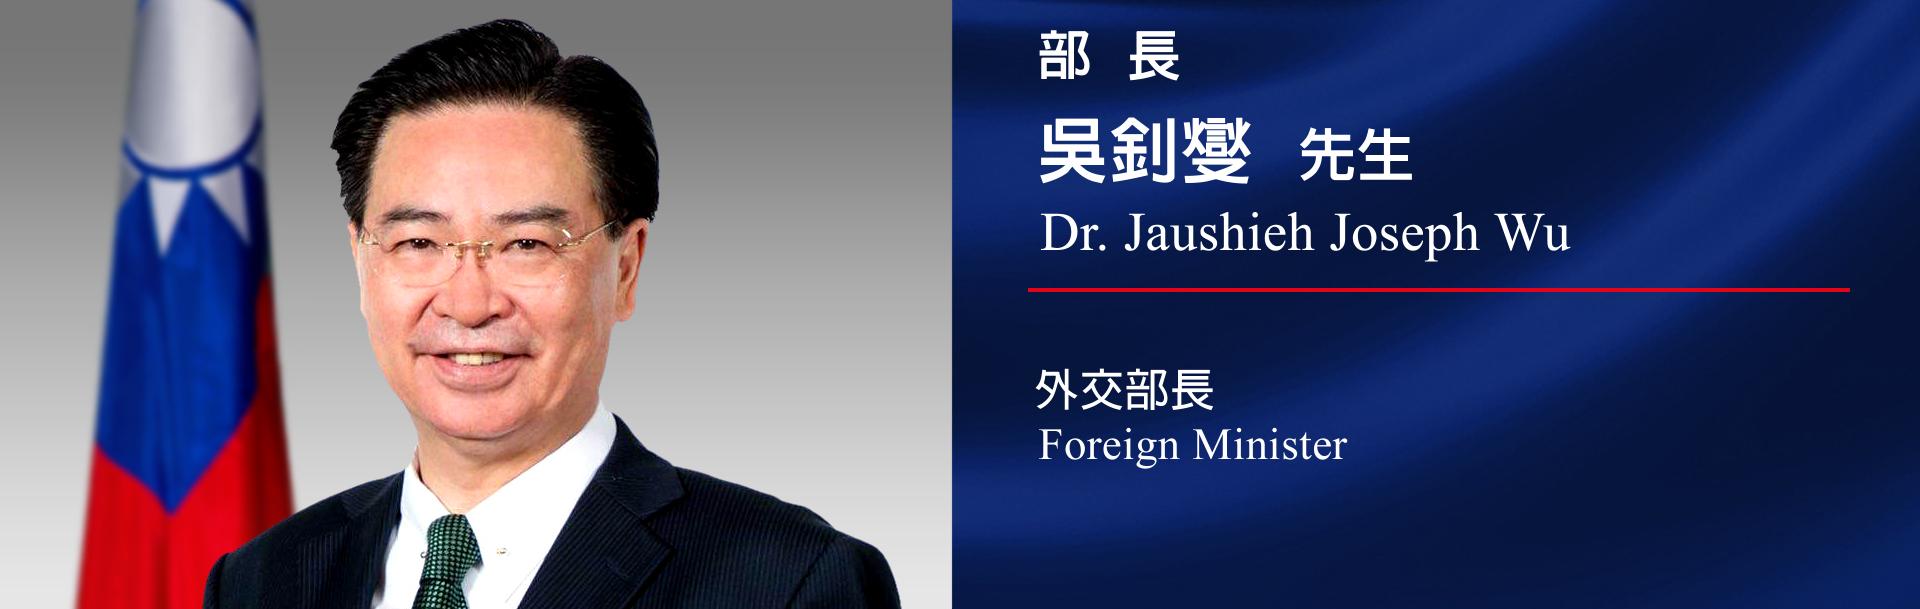 吳釗燮 Dr. Jaushieh Joseph Wu